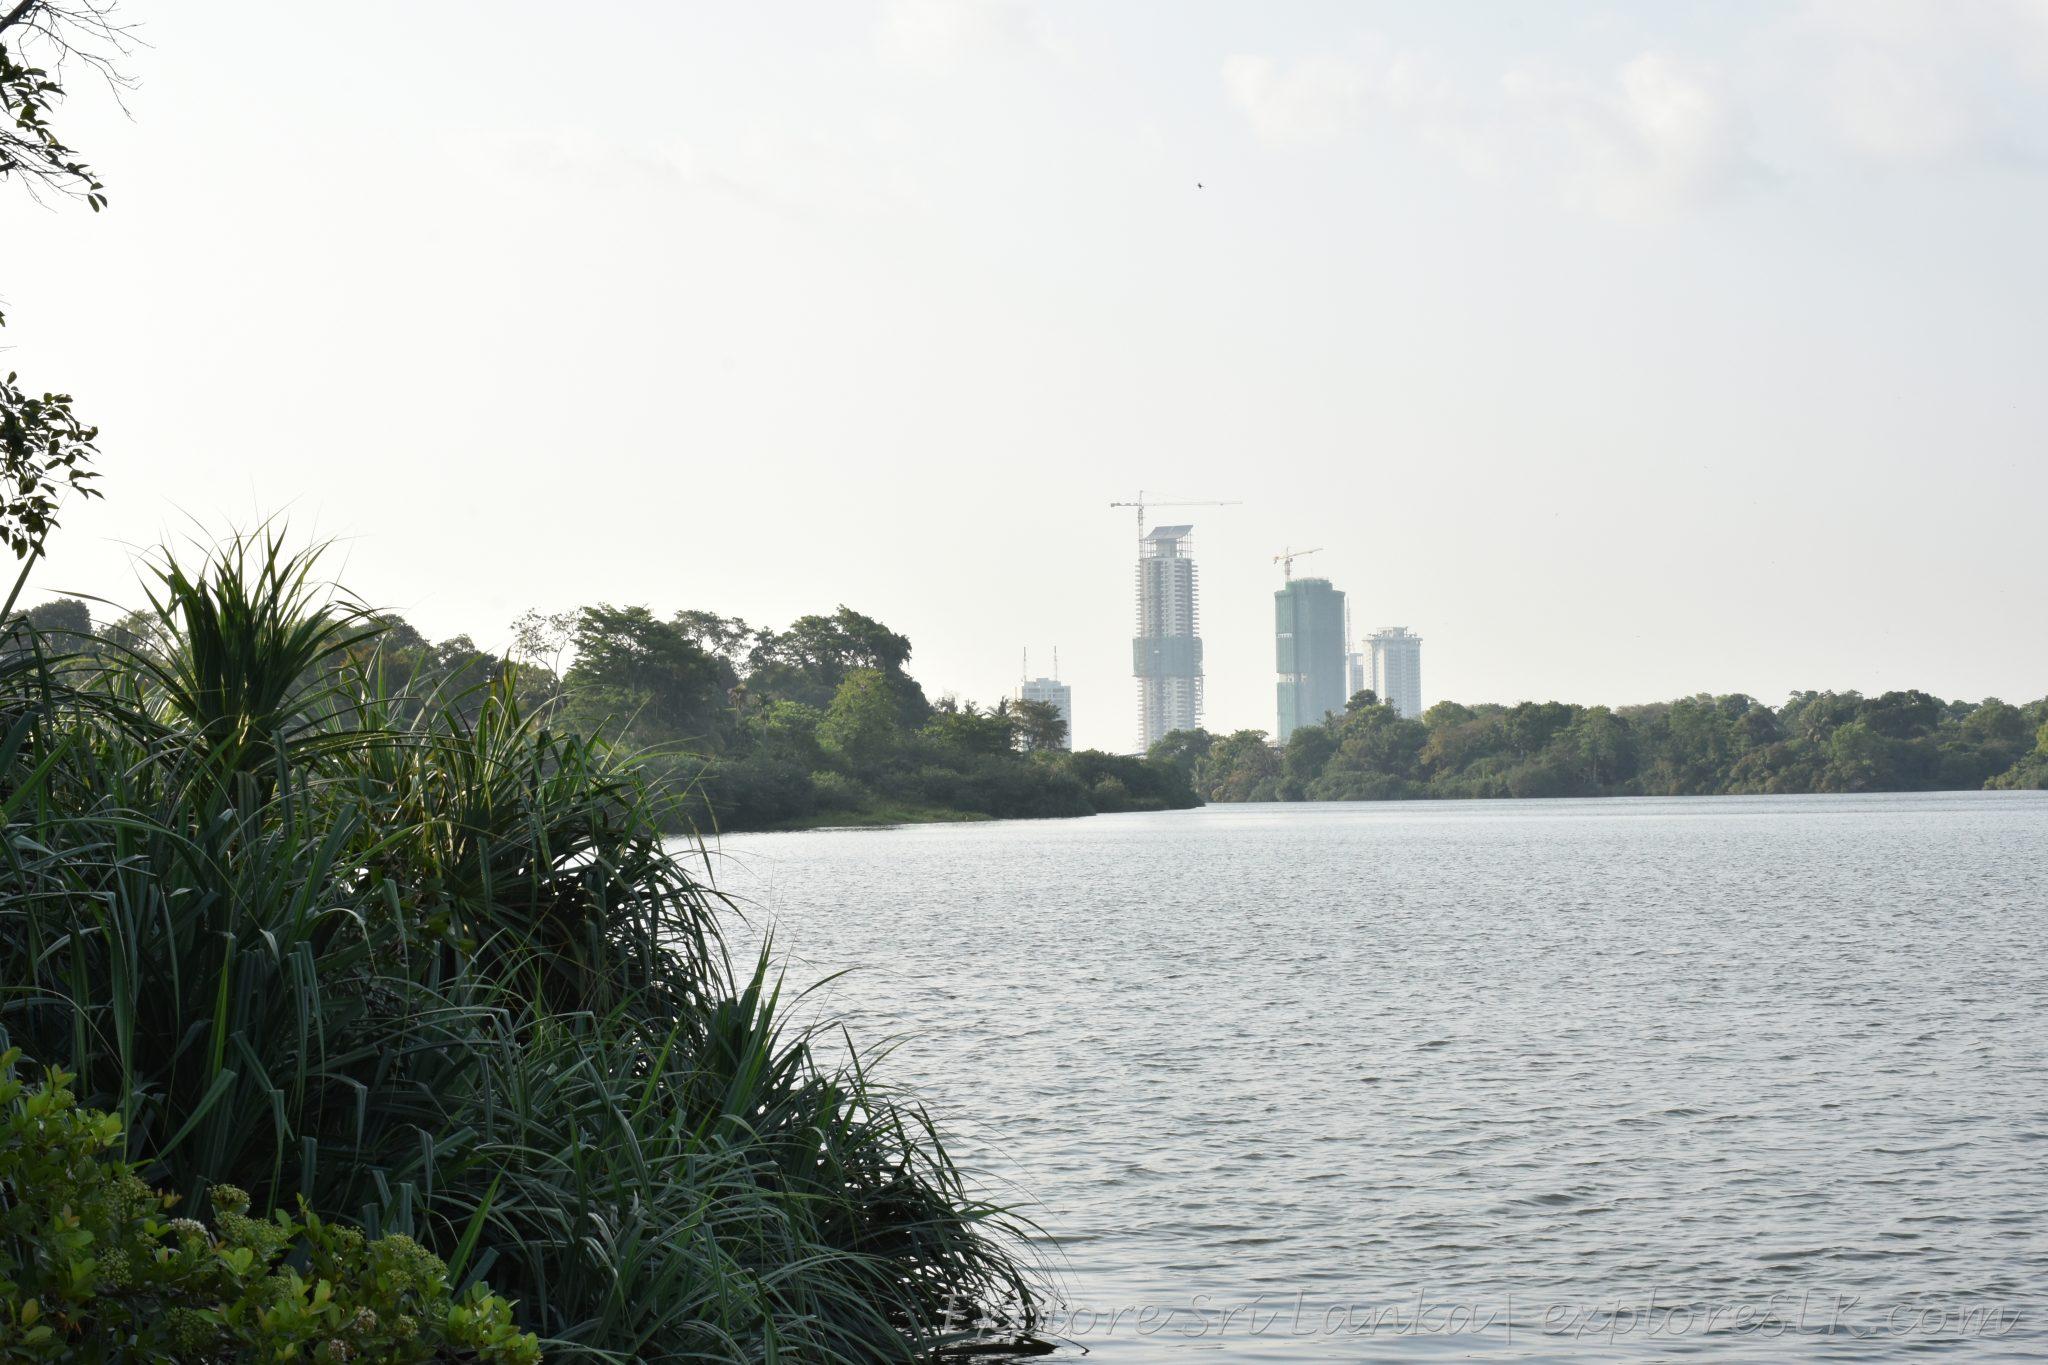 View of Diyawanna Lake from Floating Deck